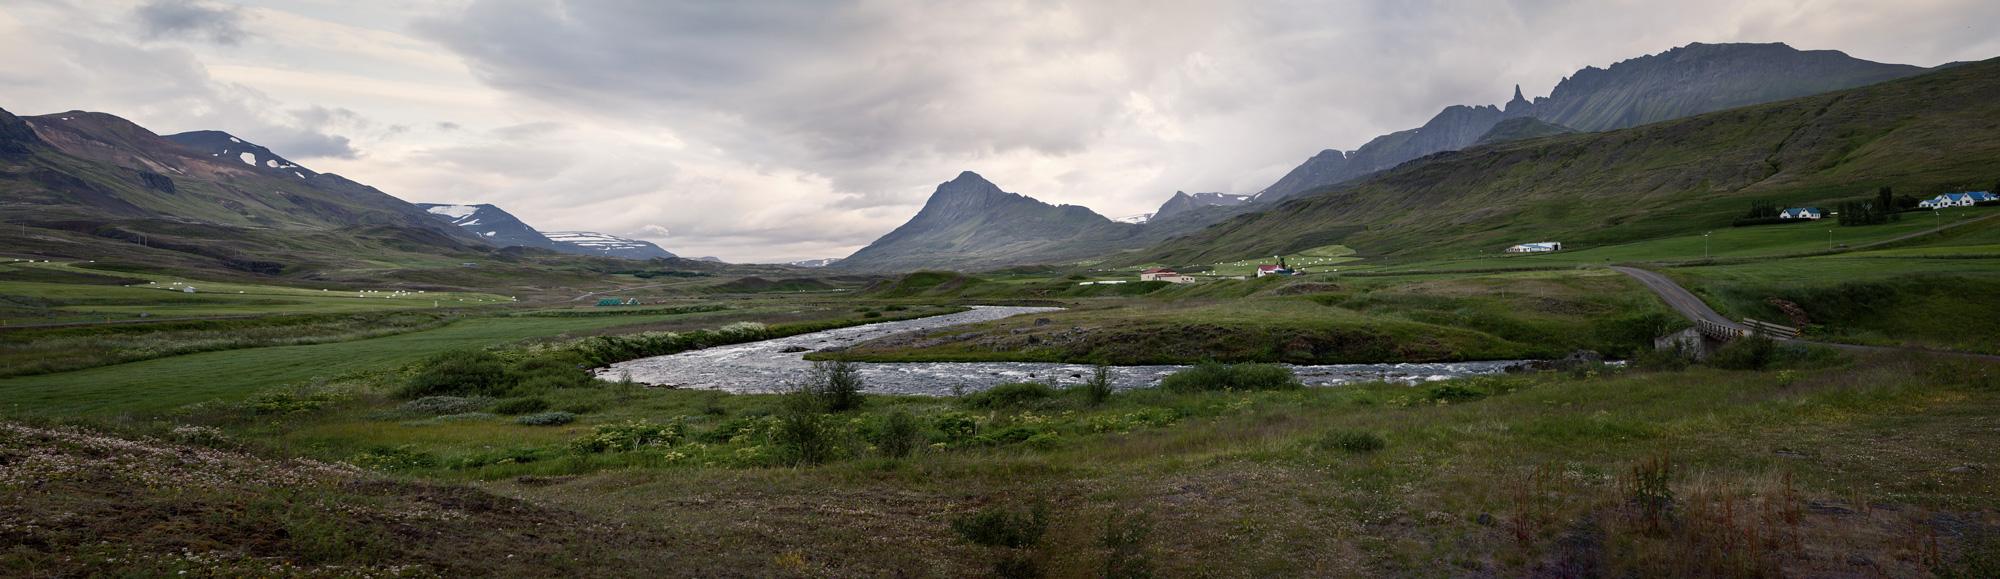 islande-nicolas-auproux-46